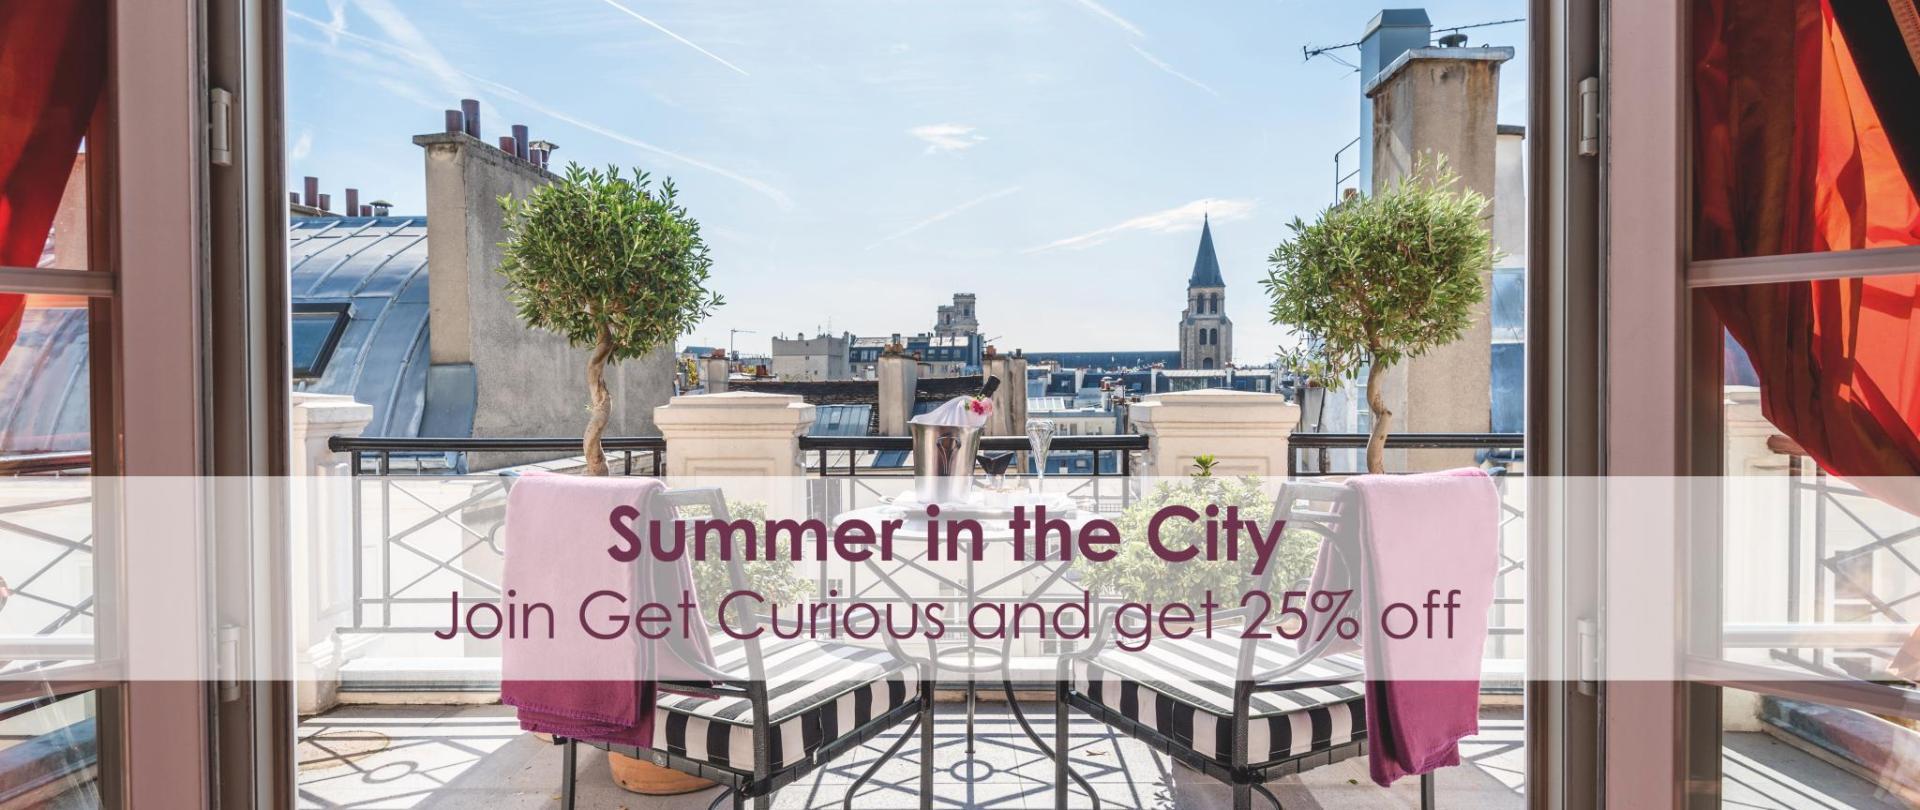 Summer in the city lhotel.jpg